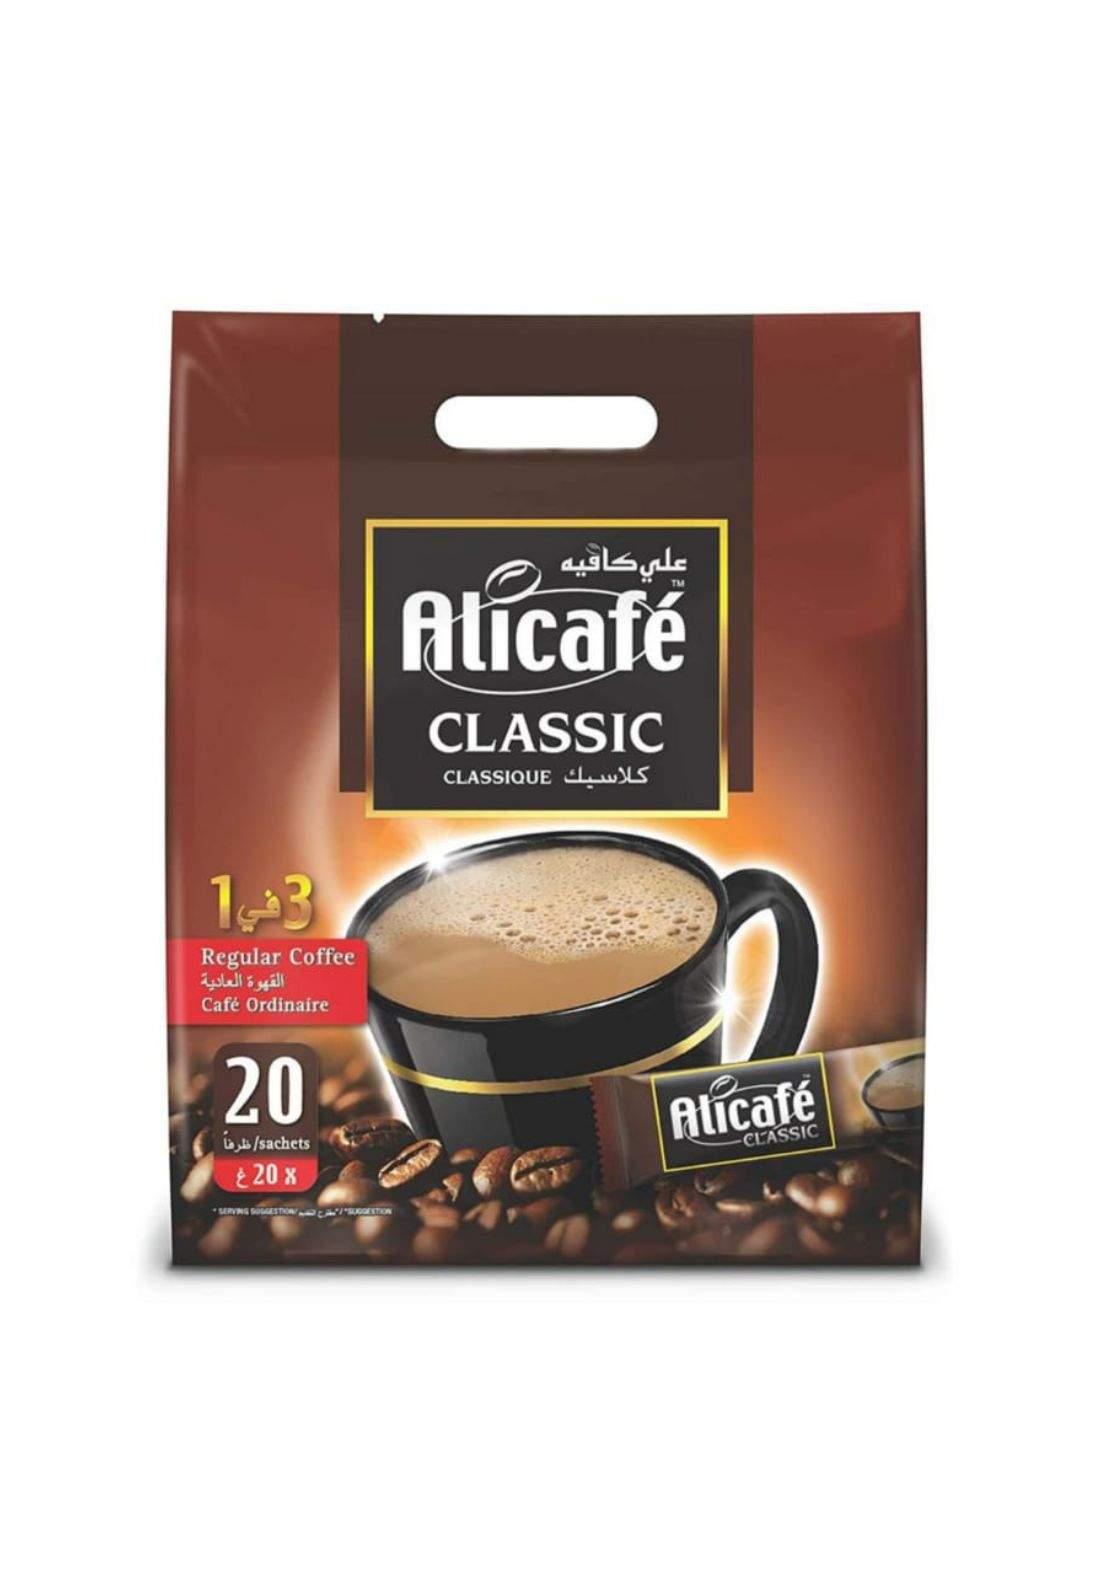 Alicafe 3in1 Classic Instant coffee علي كافية قهوة سريعة التحضير 20 ظرف